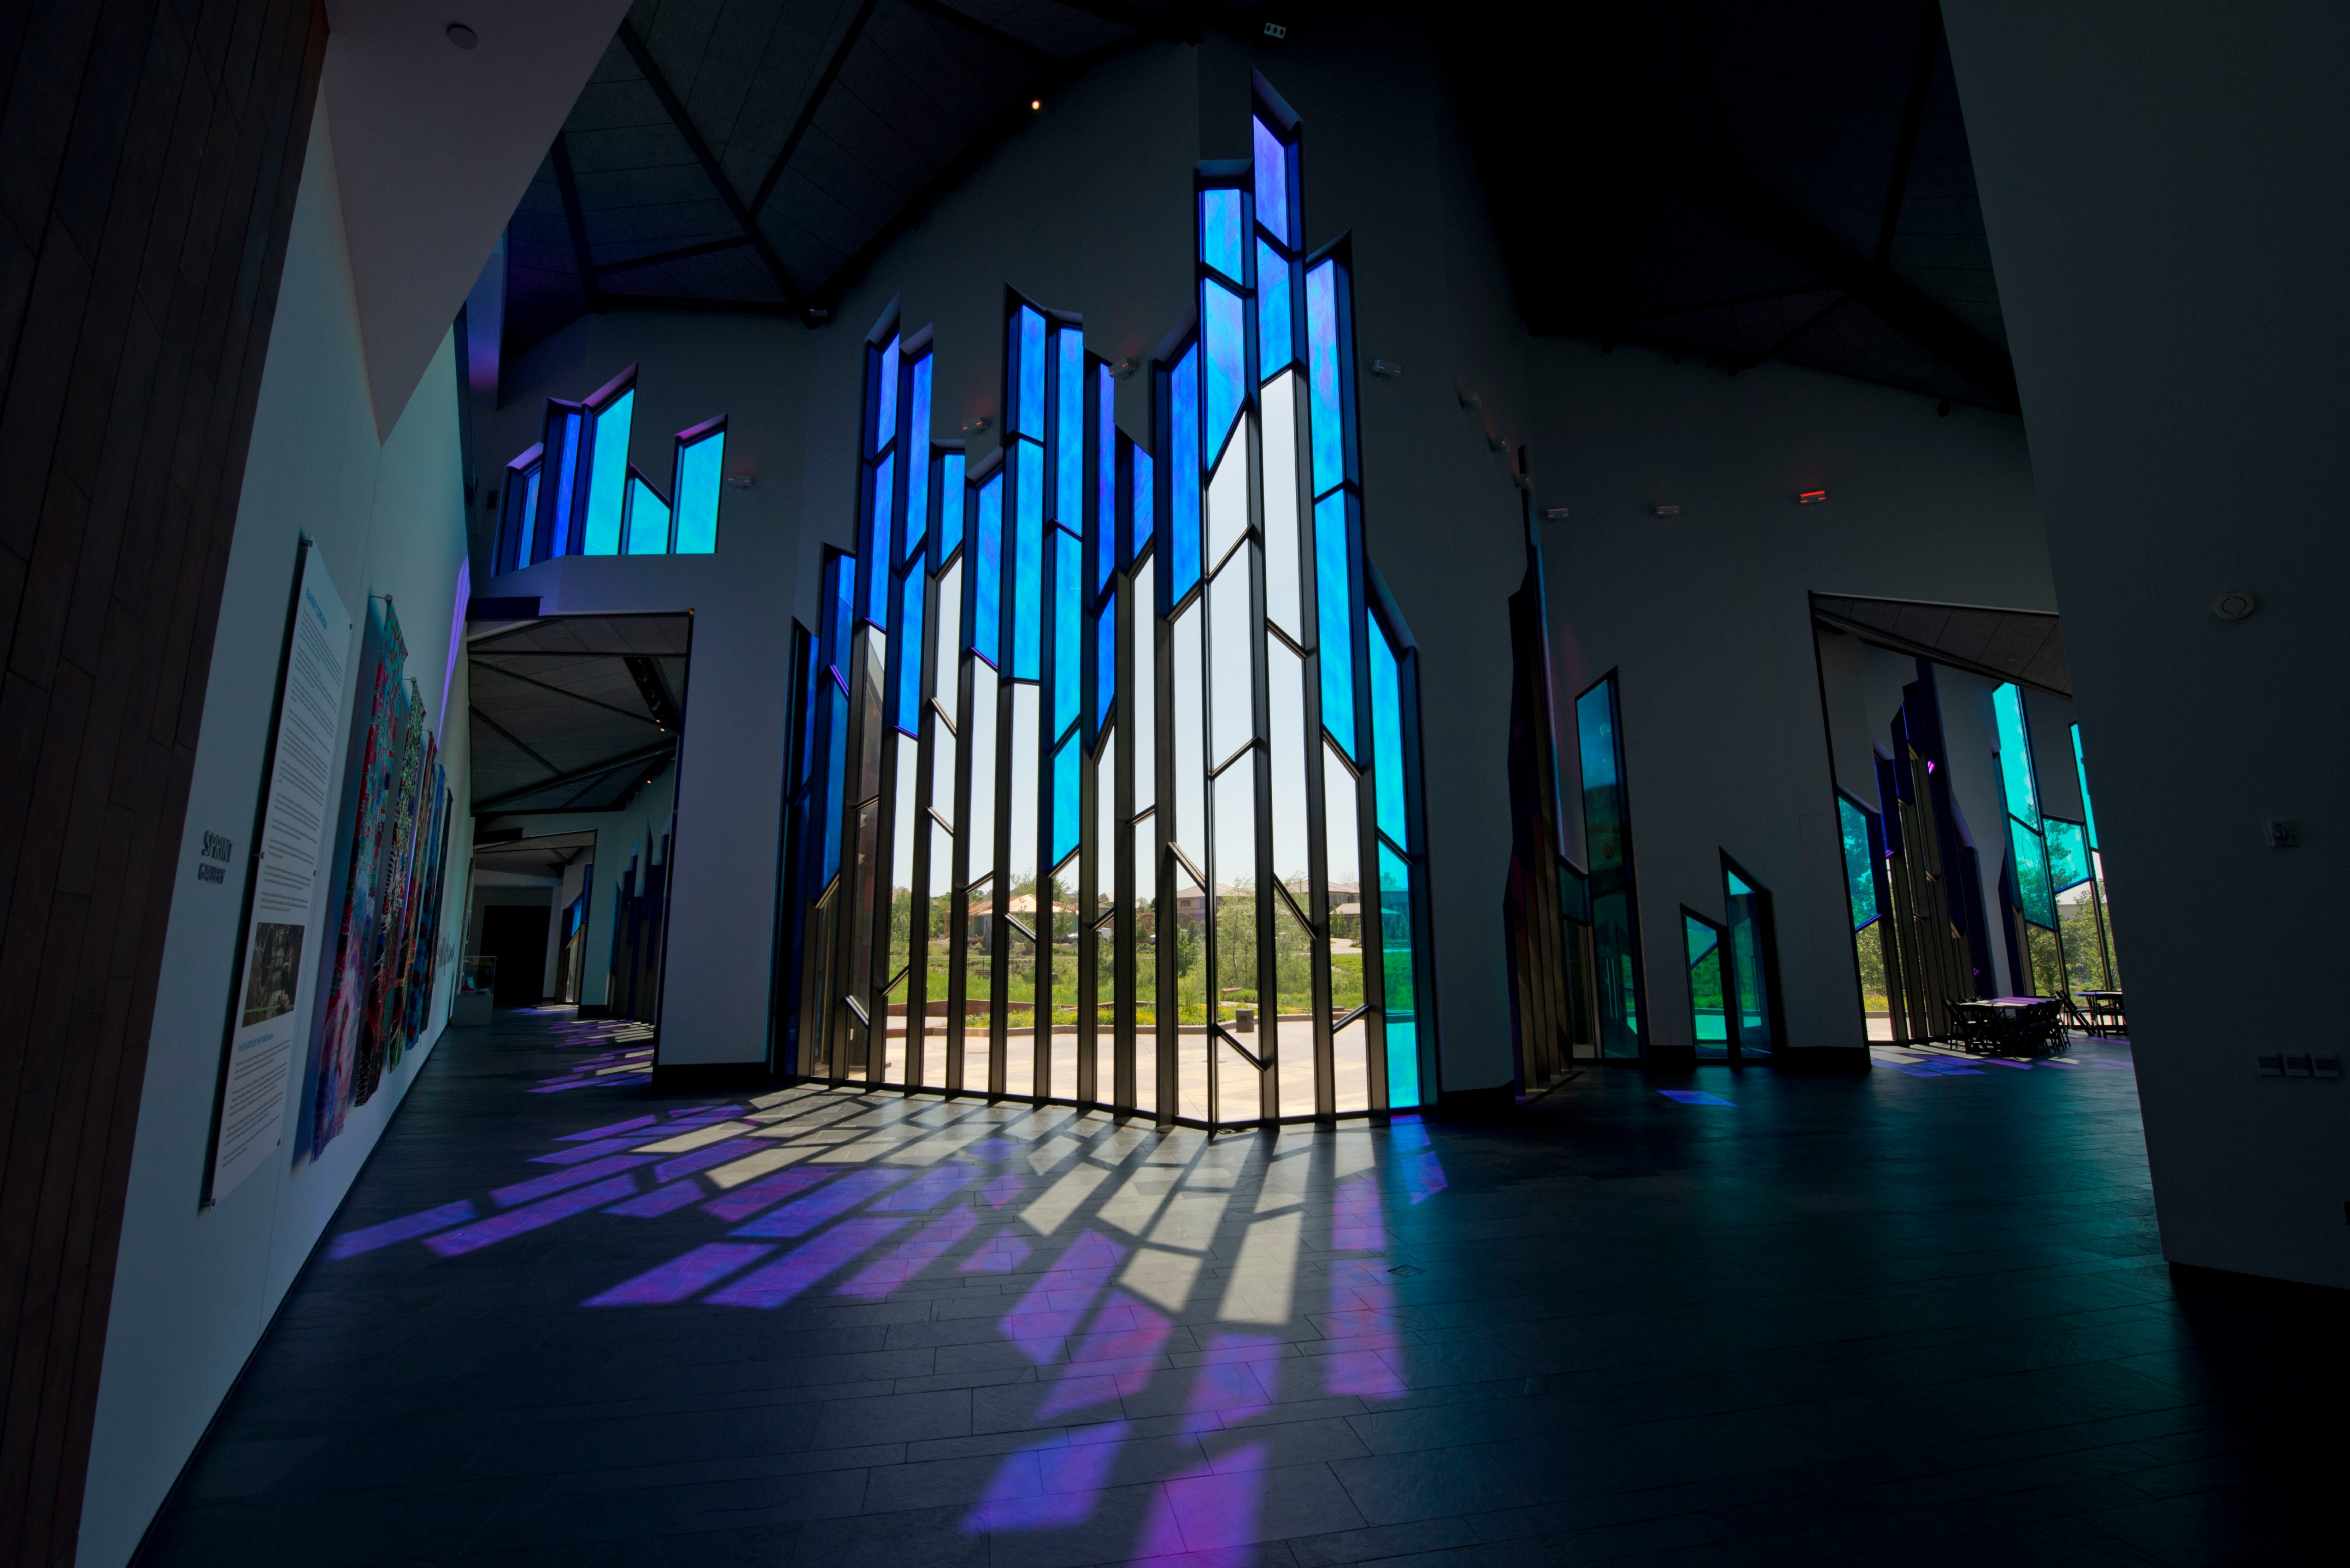 Kansas, Overland Park, Museum at Prairiefire, Interior View